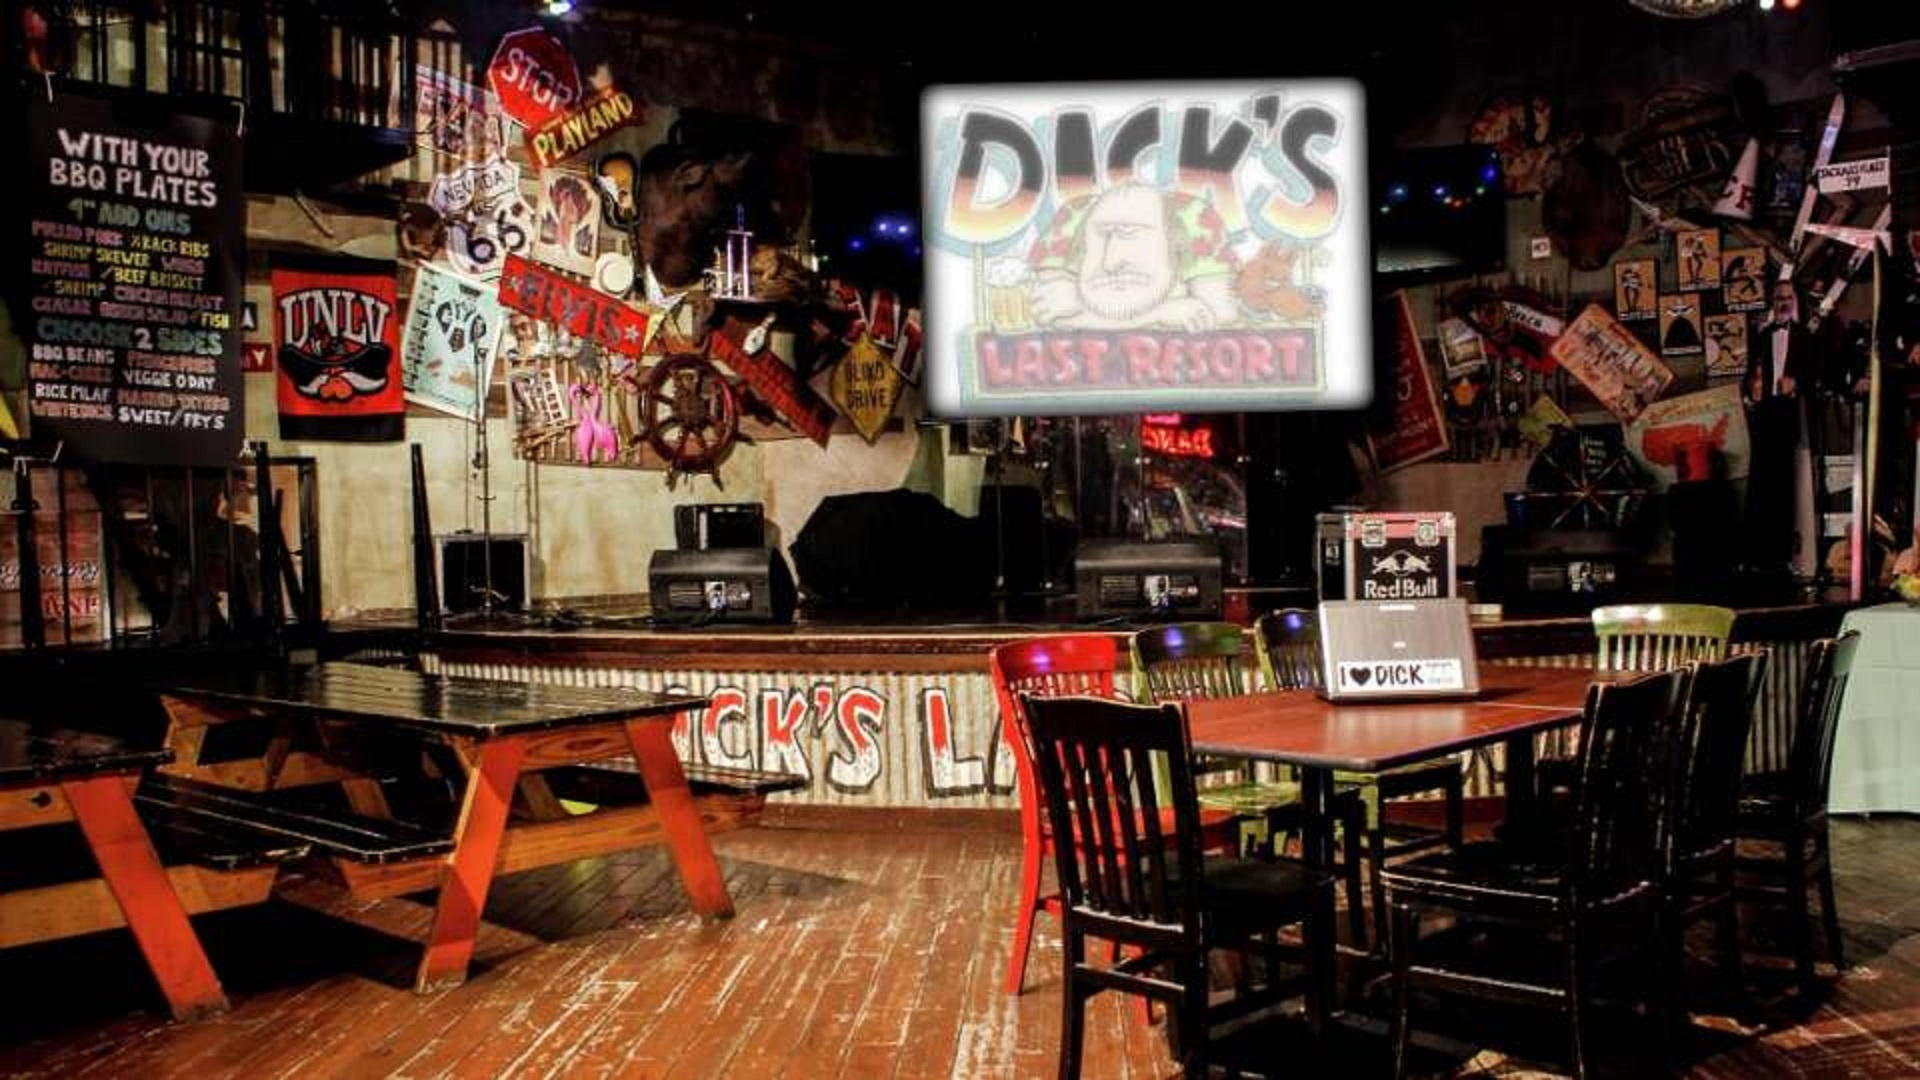 Dick's Last Resort Photo Tour